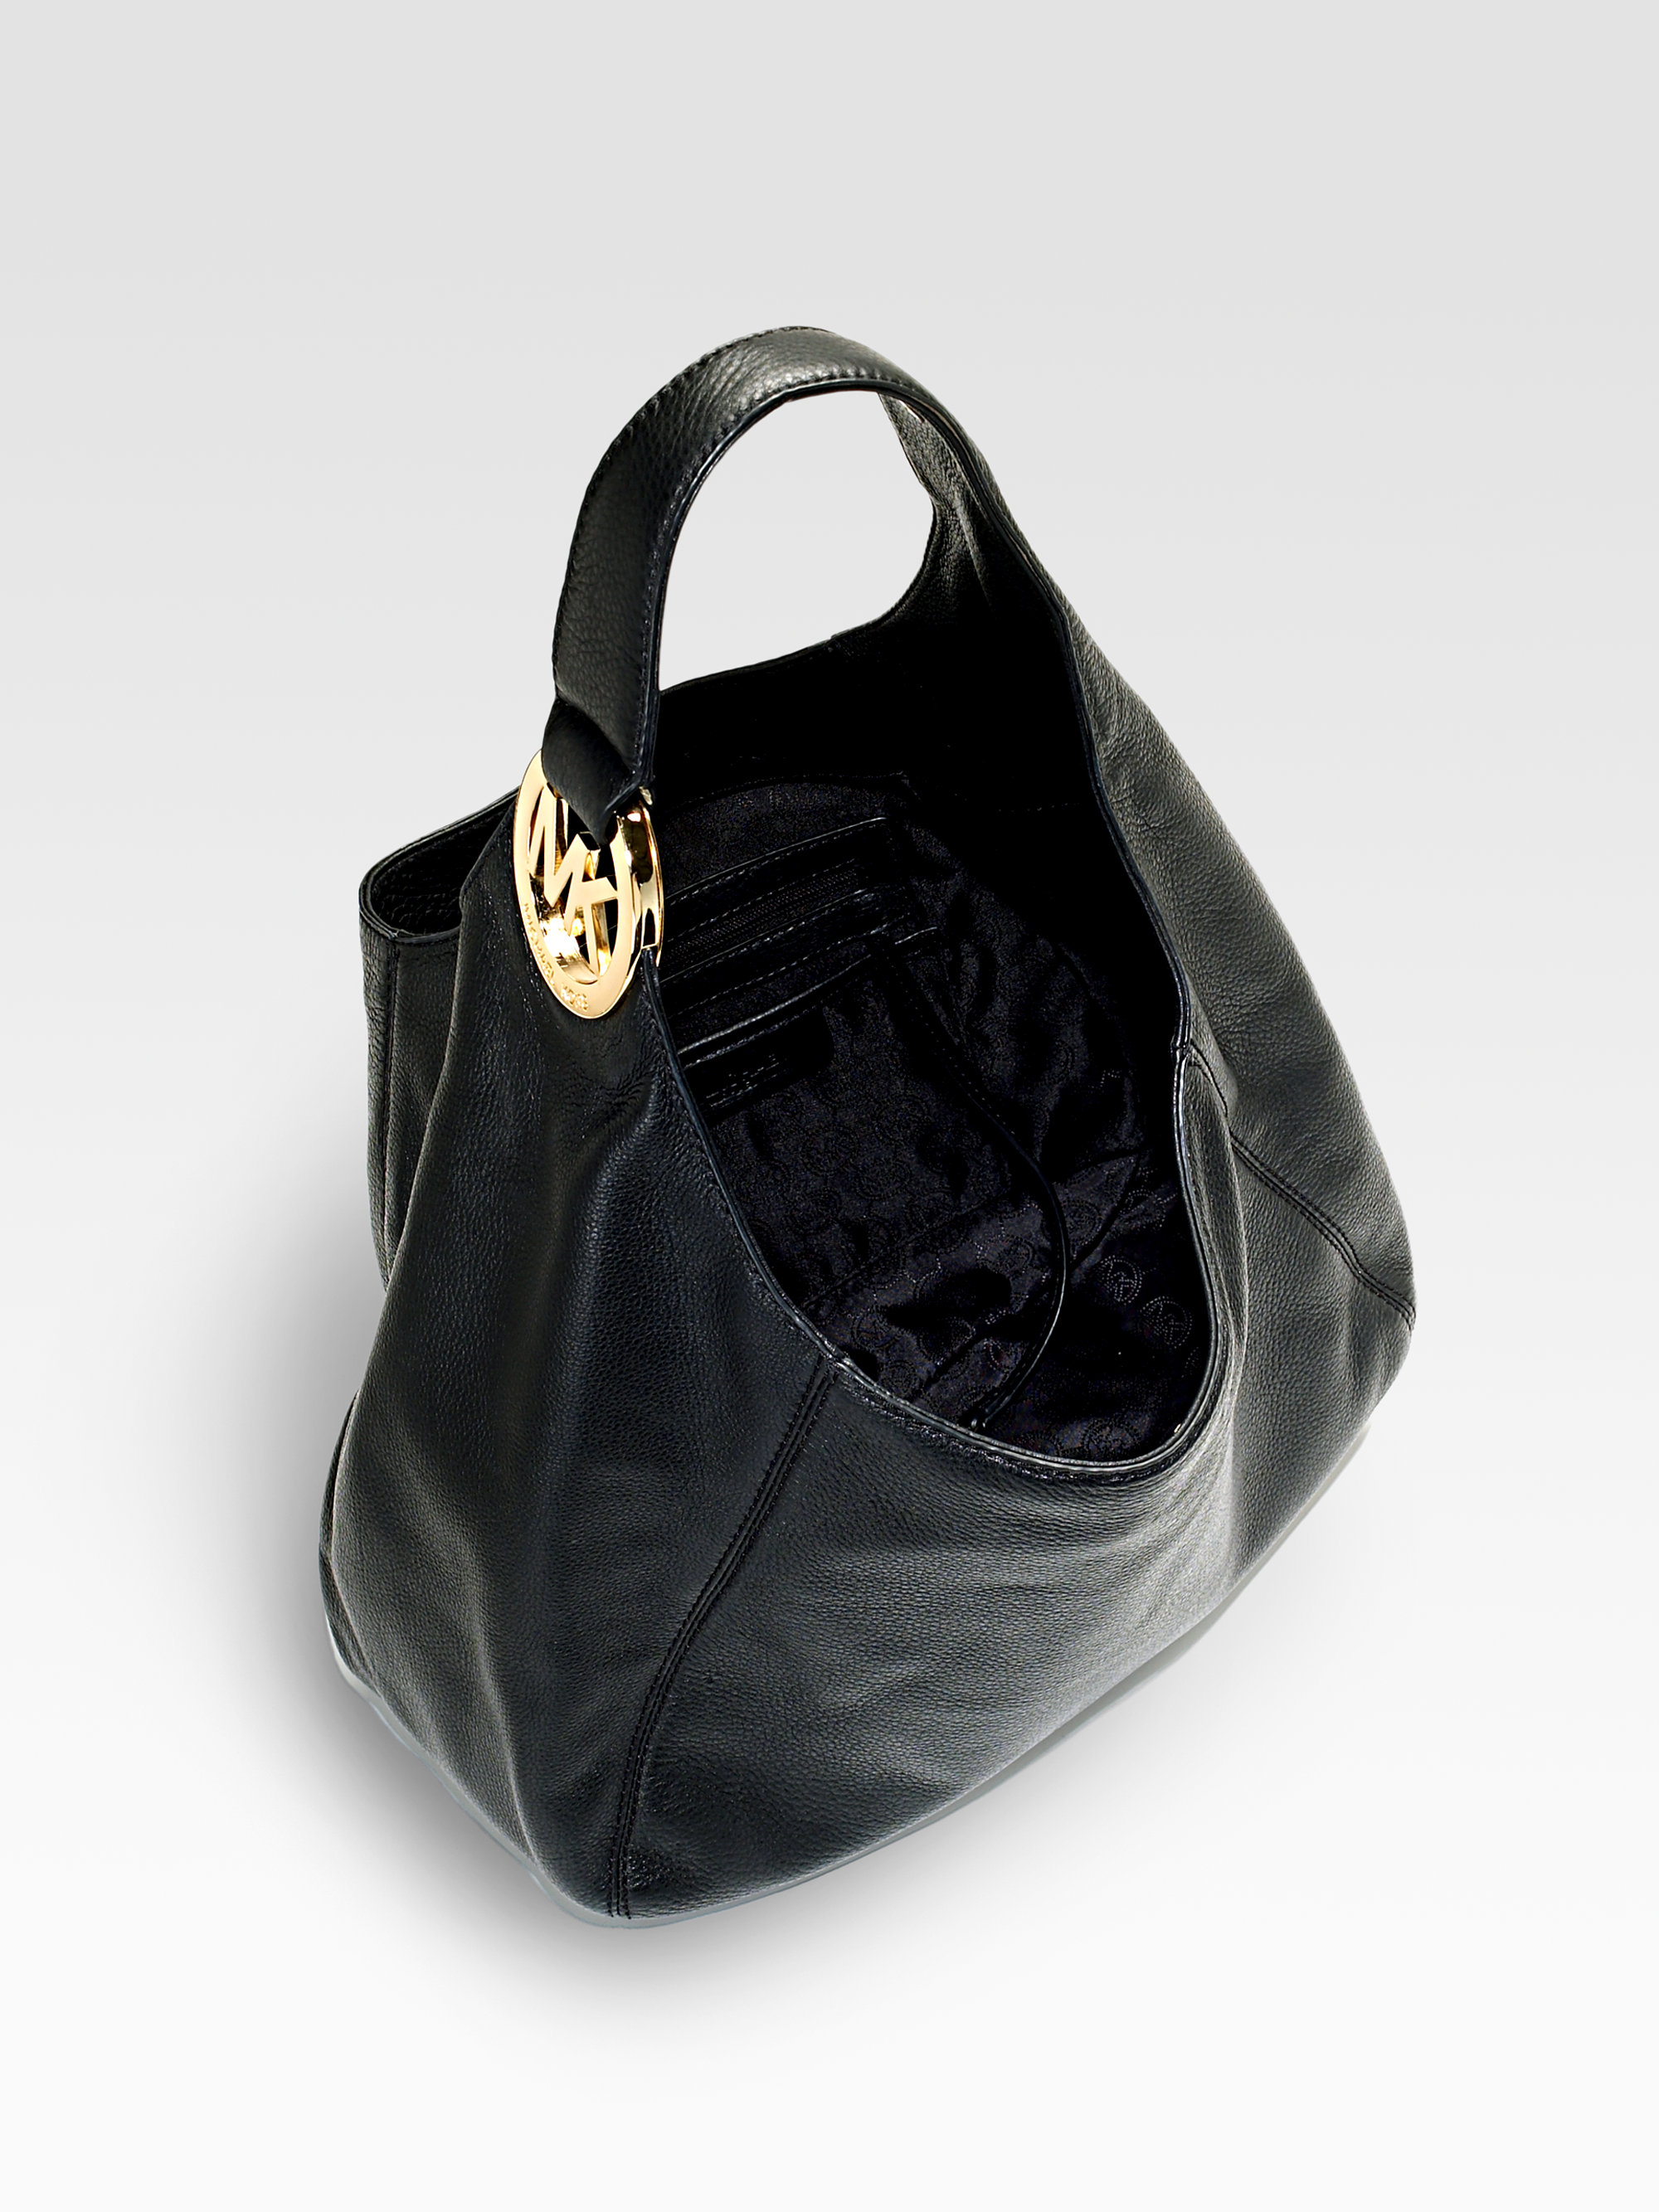 Michael michael kors Fulton Large Shoulder Bag in Black | Lyst